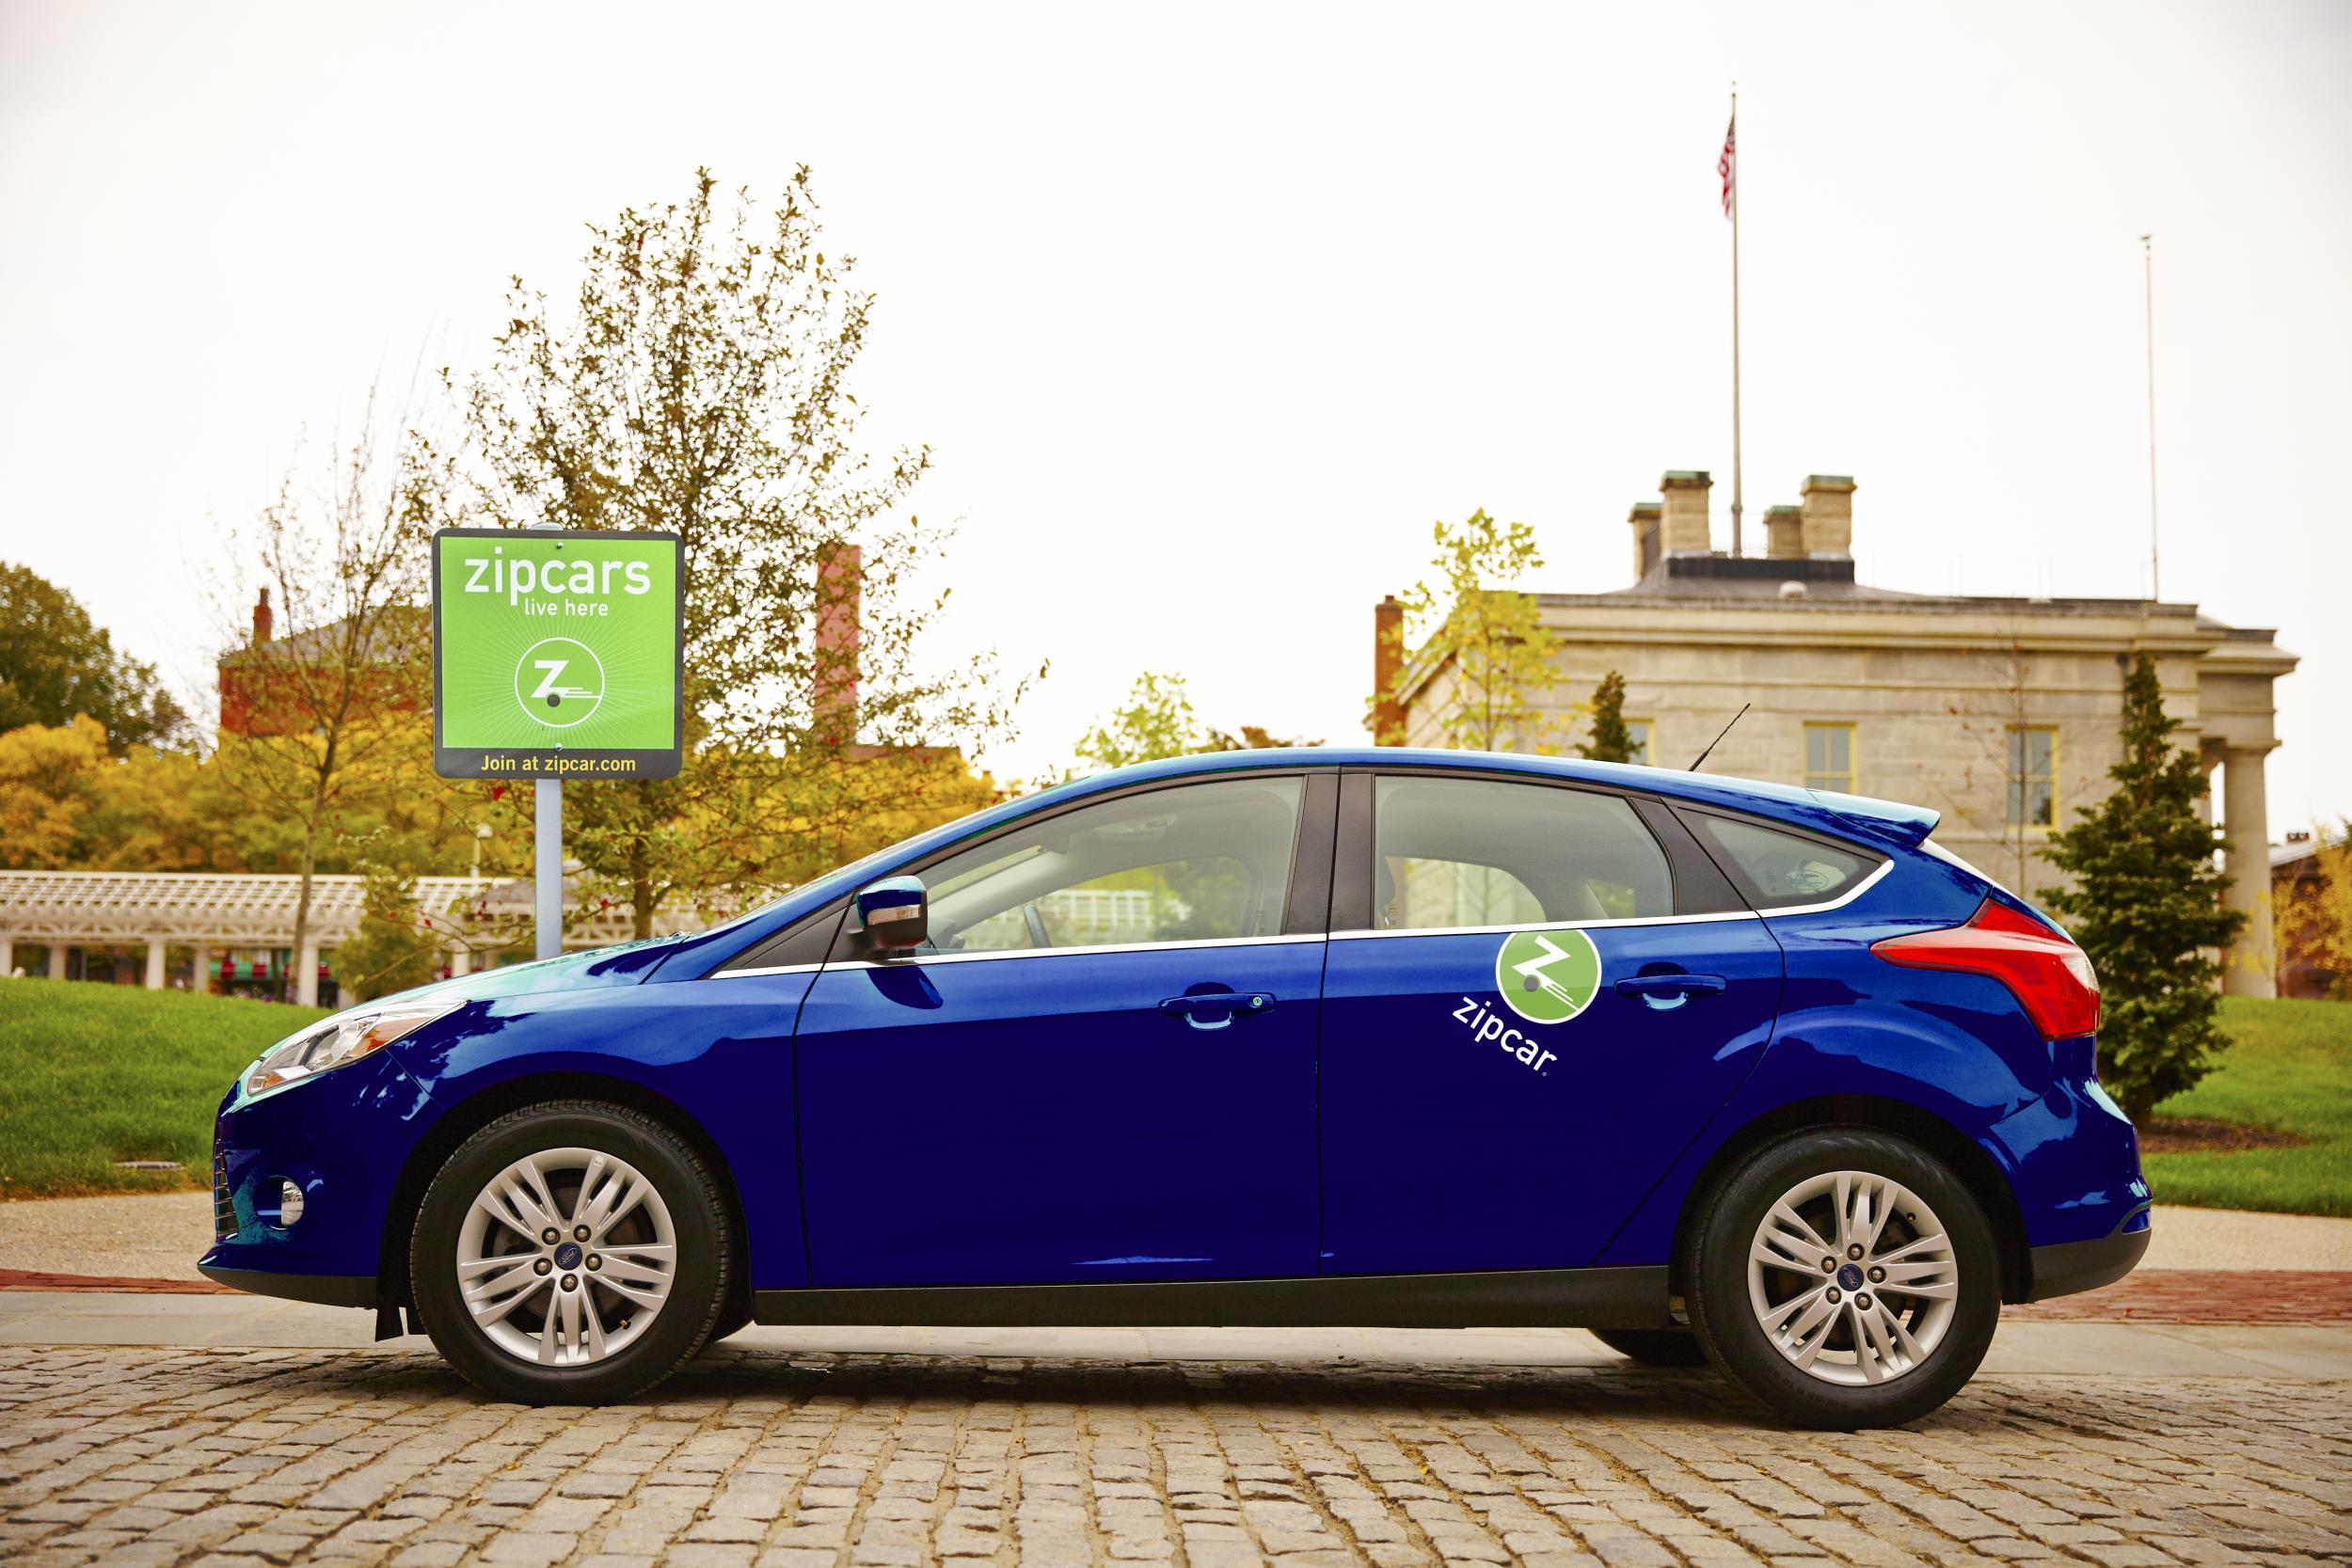 Zipcar Coming To A Corner Near You The Santa Barbara Independent